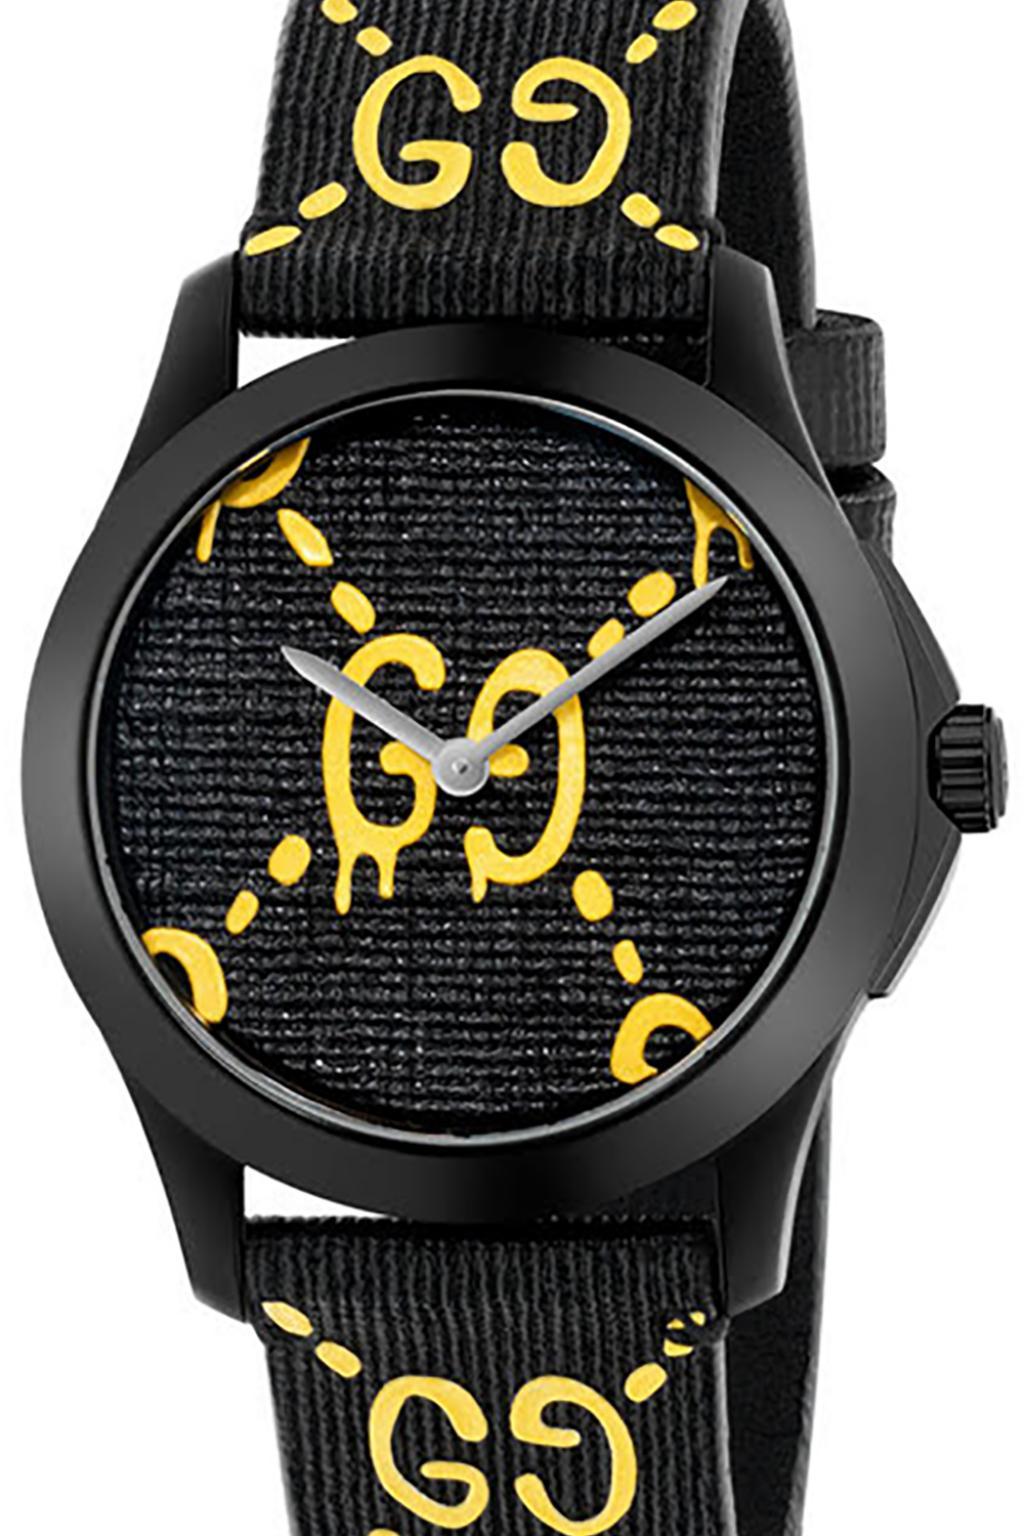 Gucci 'G-Timeless' watch